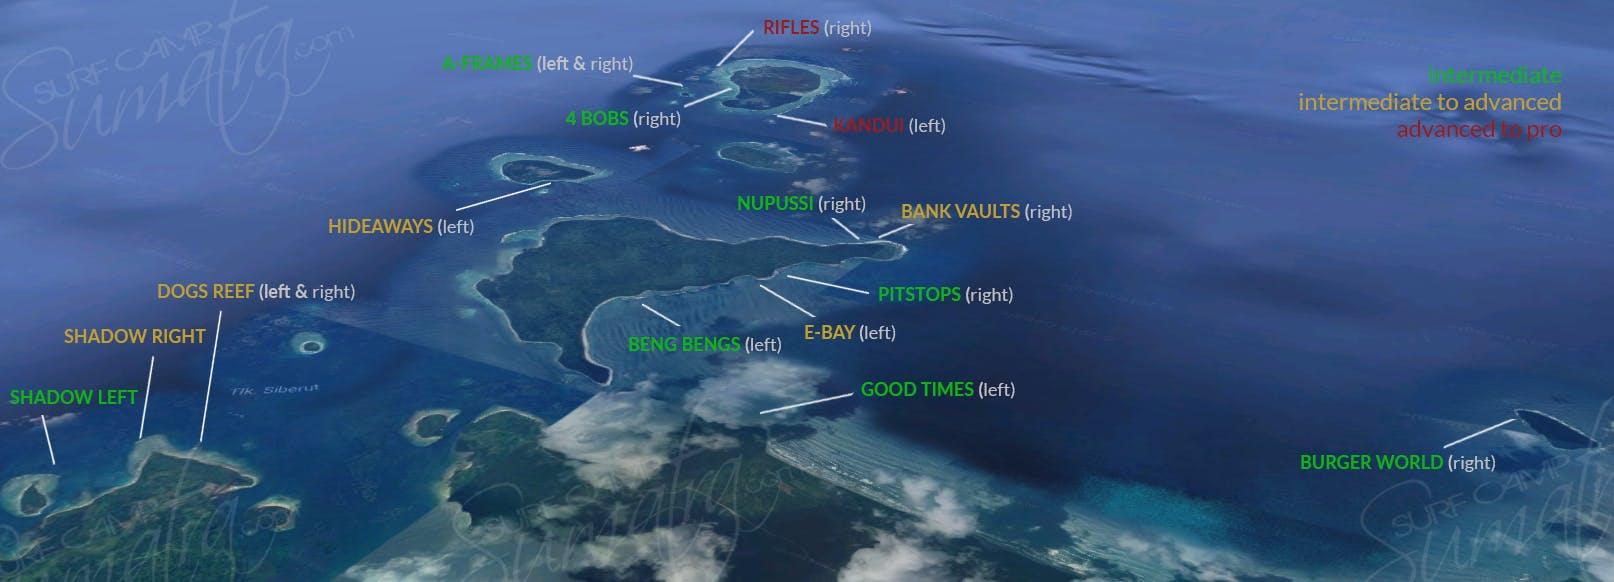 surf mentawai map